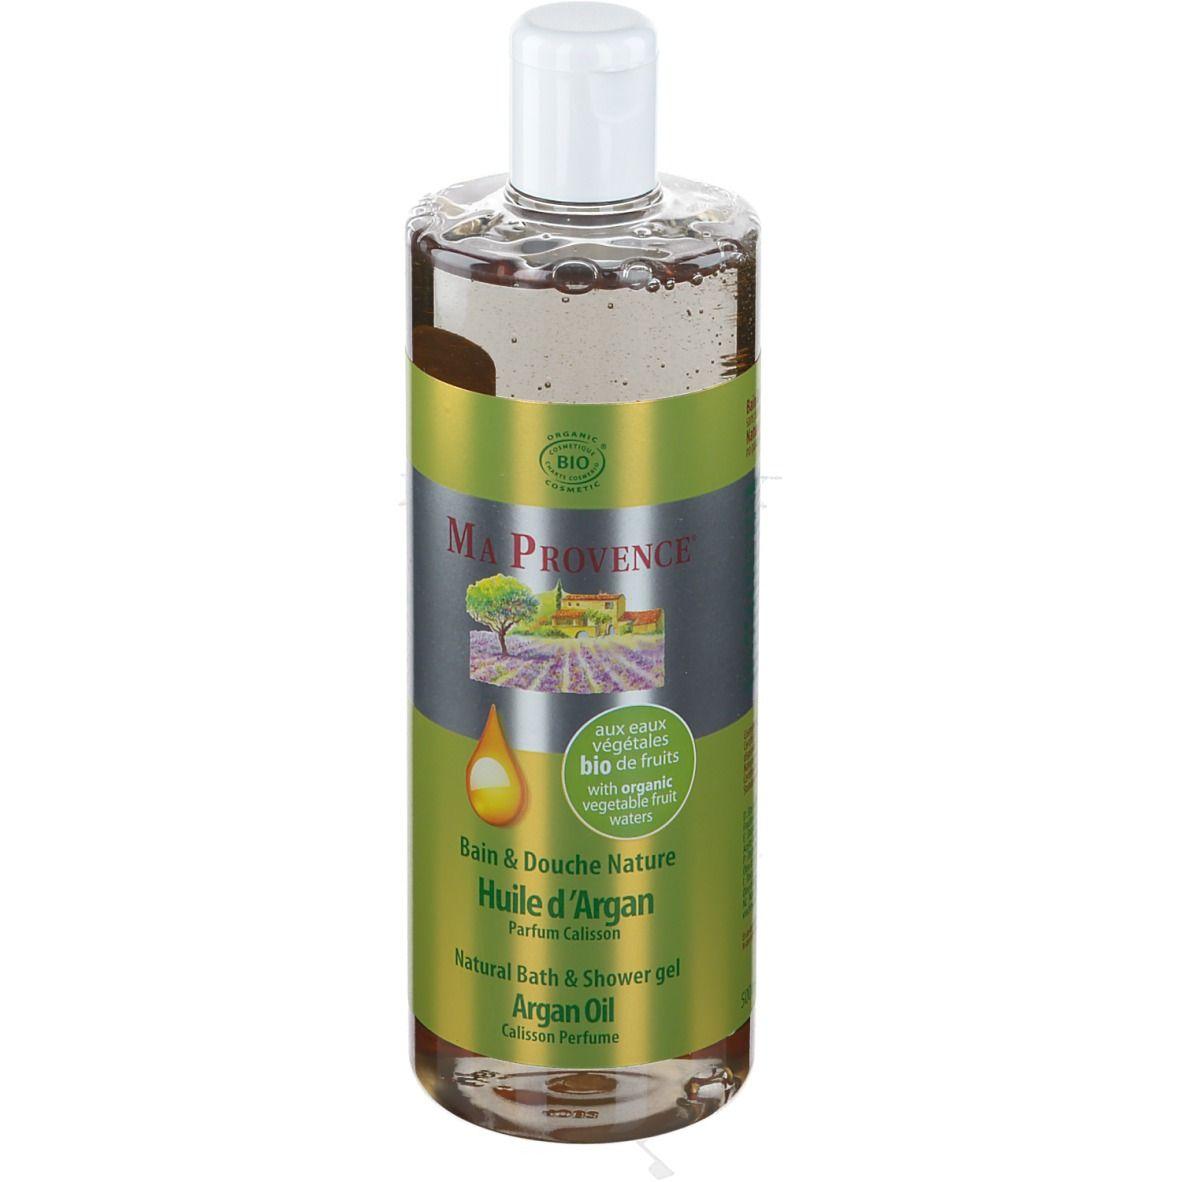 Ma Provence® Bain & Douche Nature Huile d'Argan Bio ml gel nettoyant